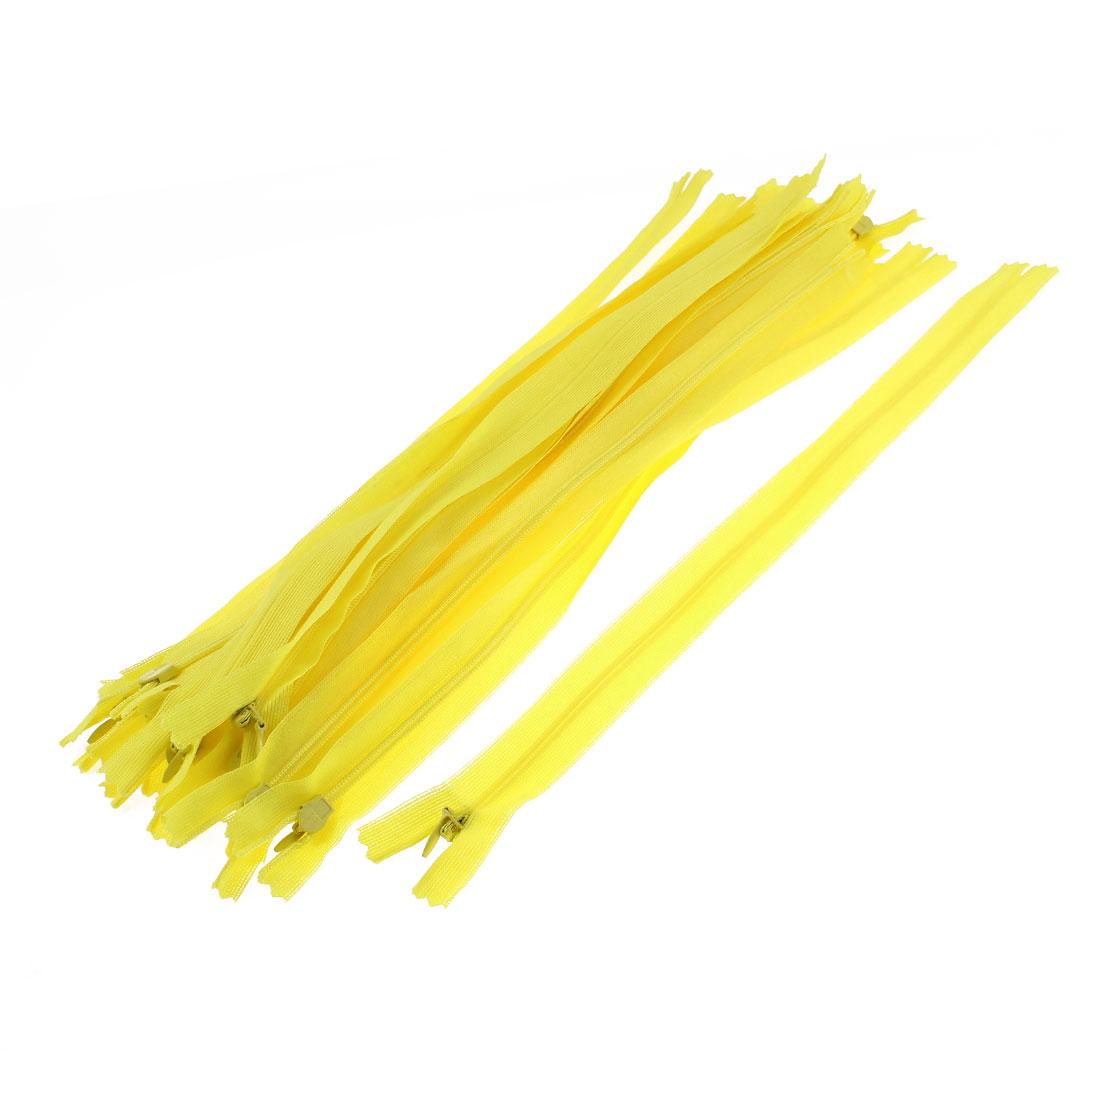 20 Pcs 12-inch Long Yellow Nylon Zippers Zips for Clothing